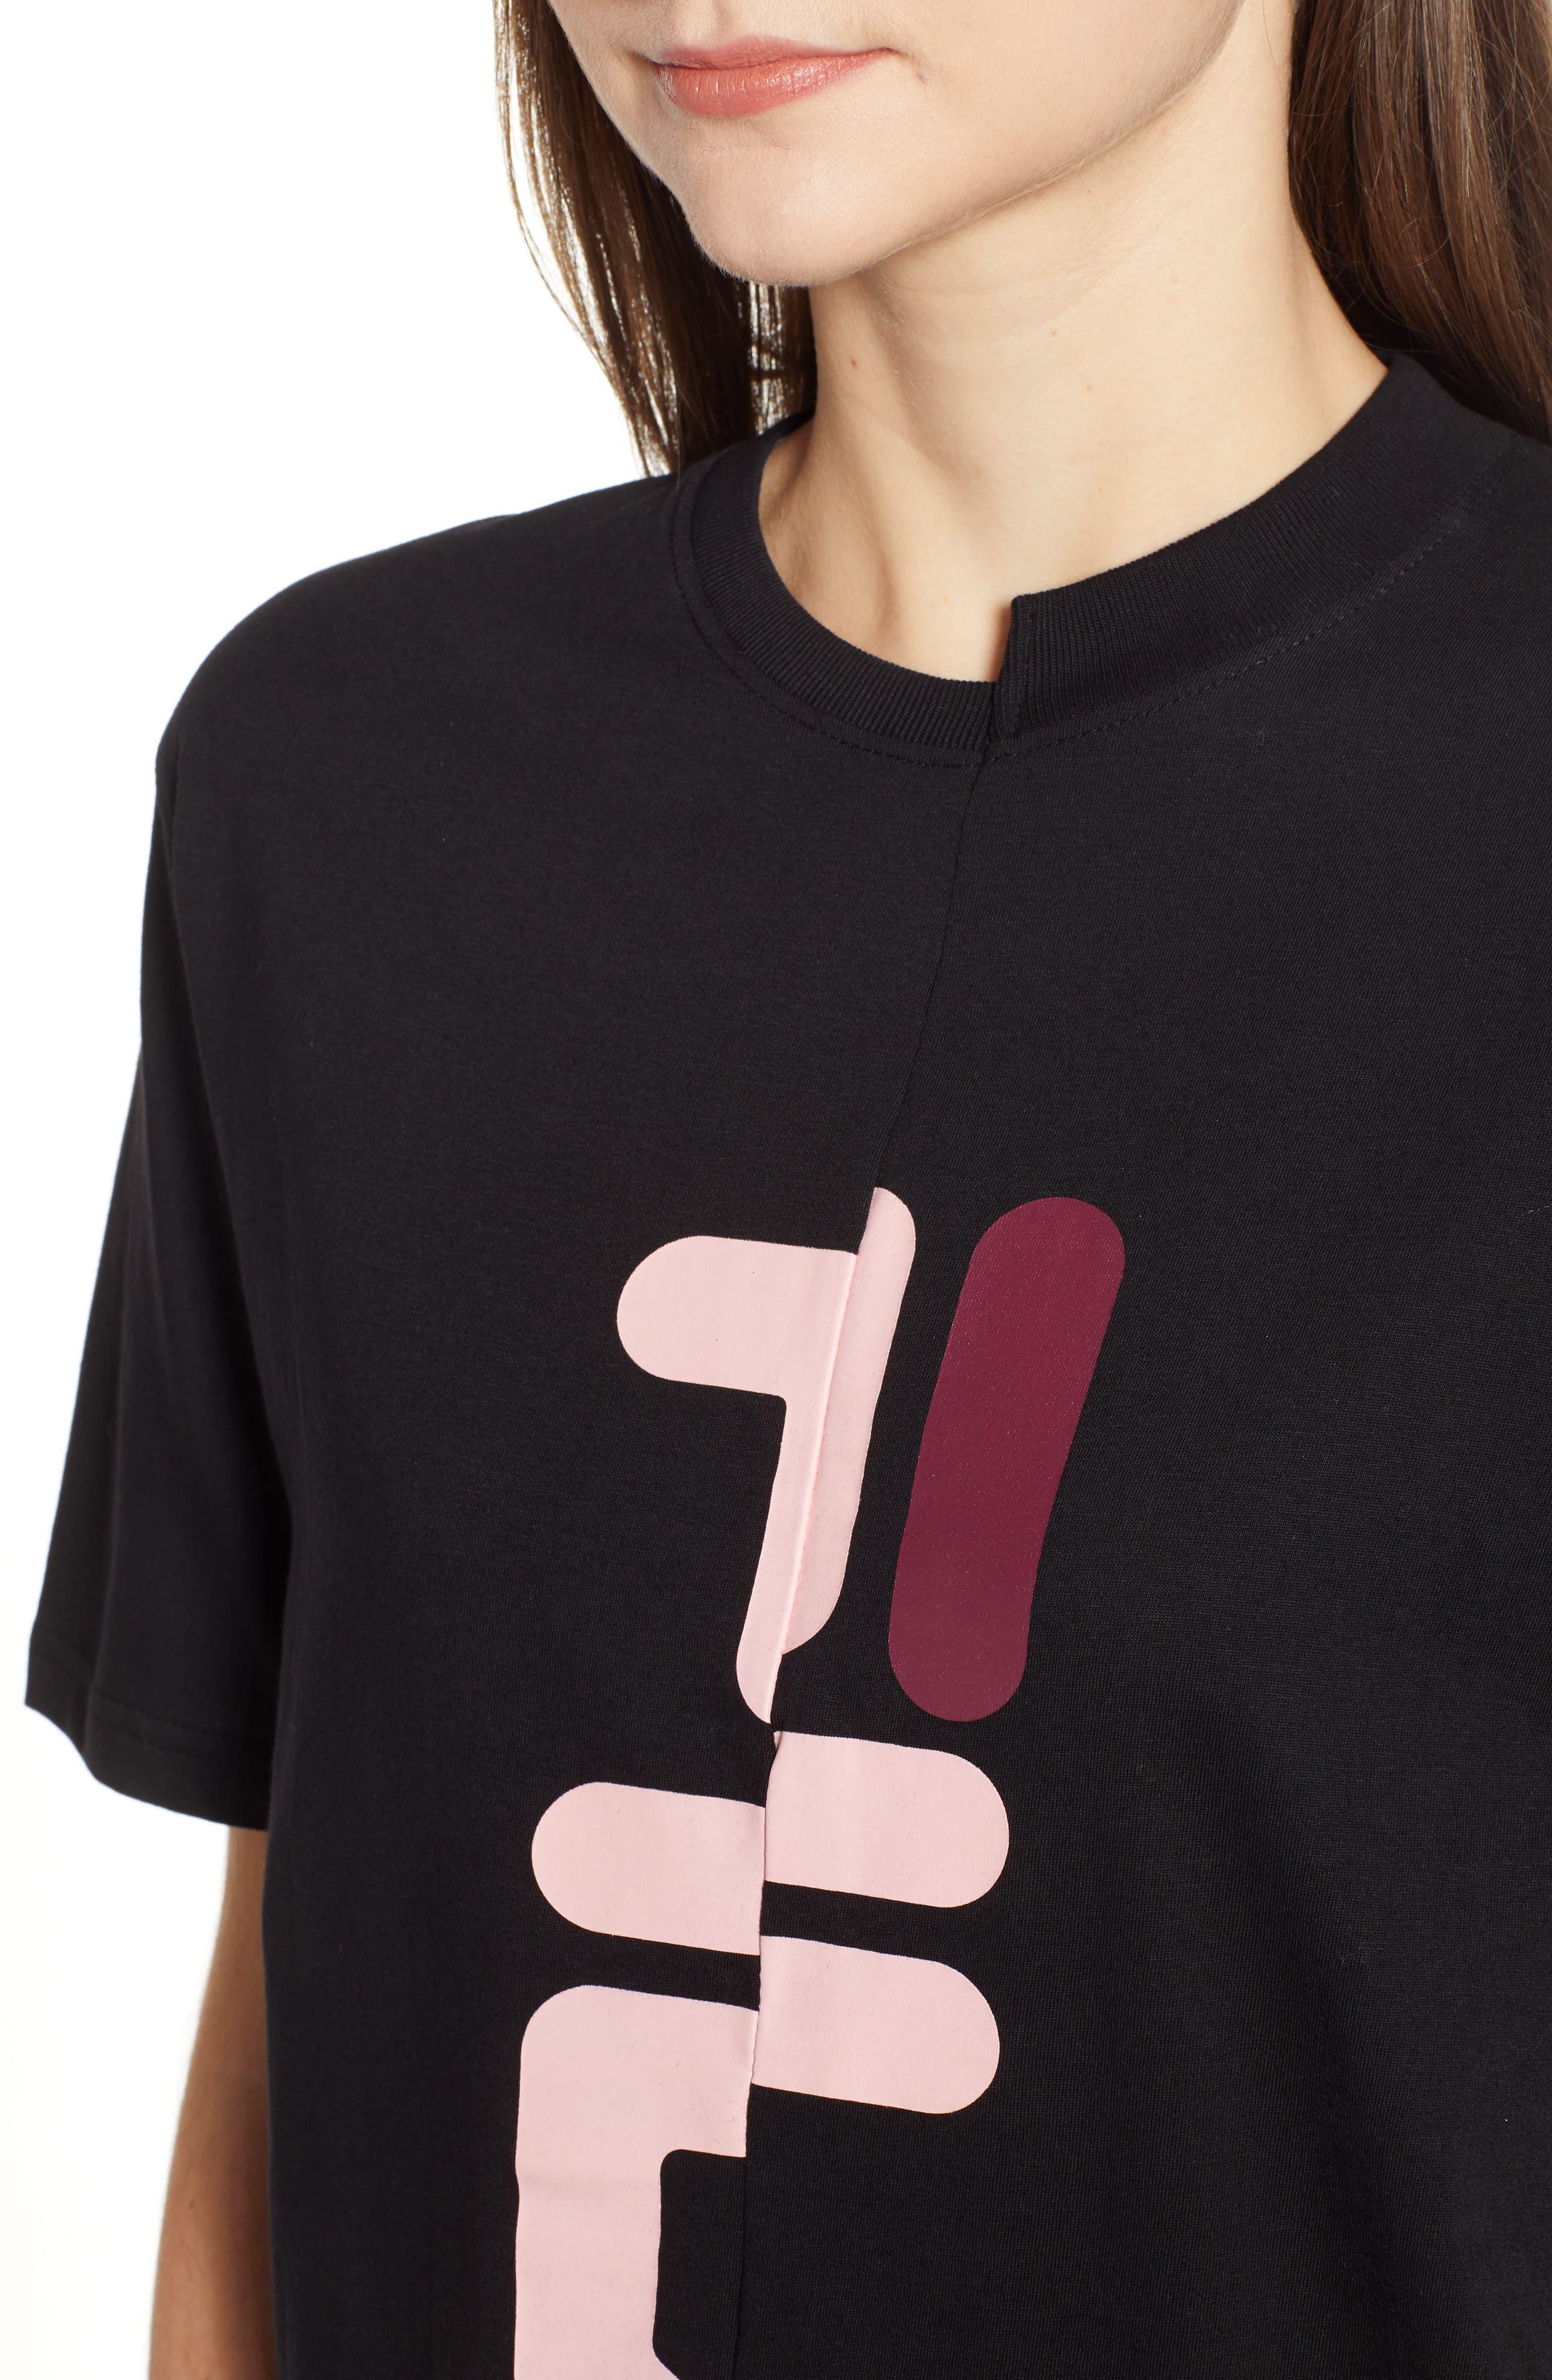 Teresa Spliced Tee,                             Alternate thumbnail 4, color,                             BLACK/ PINK/RED